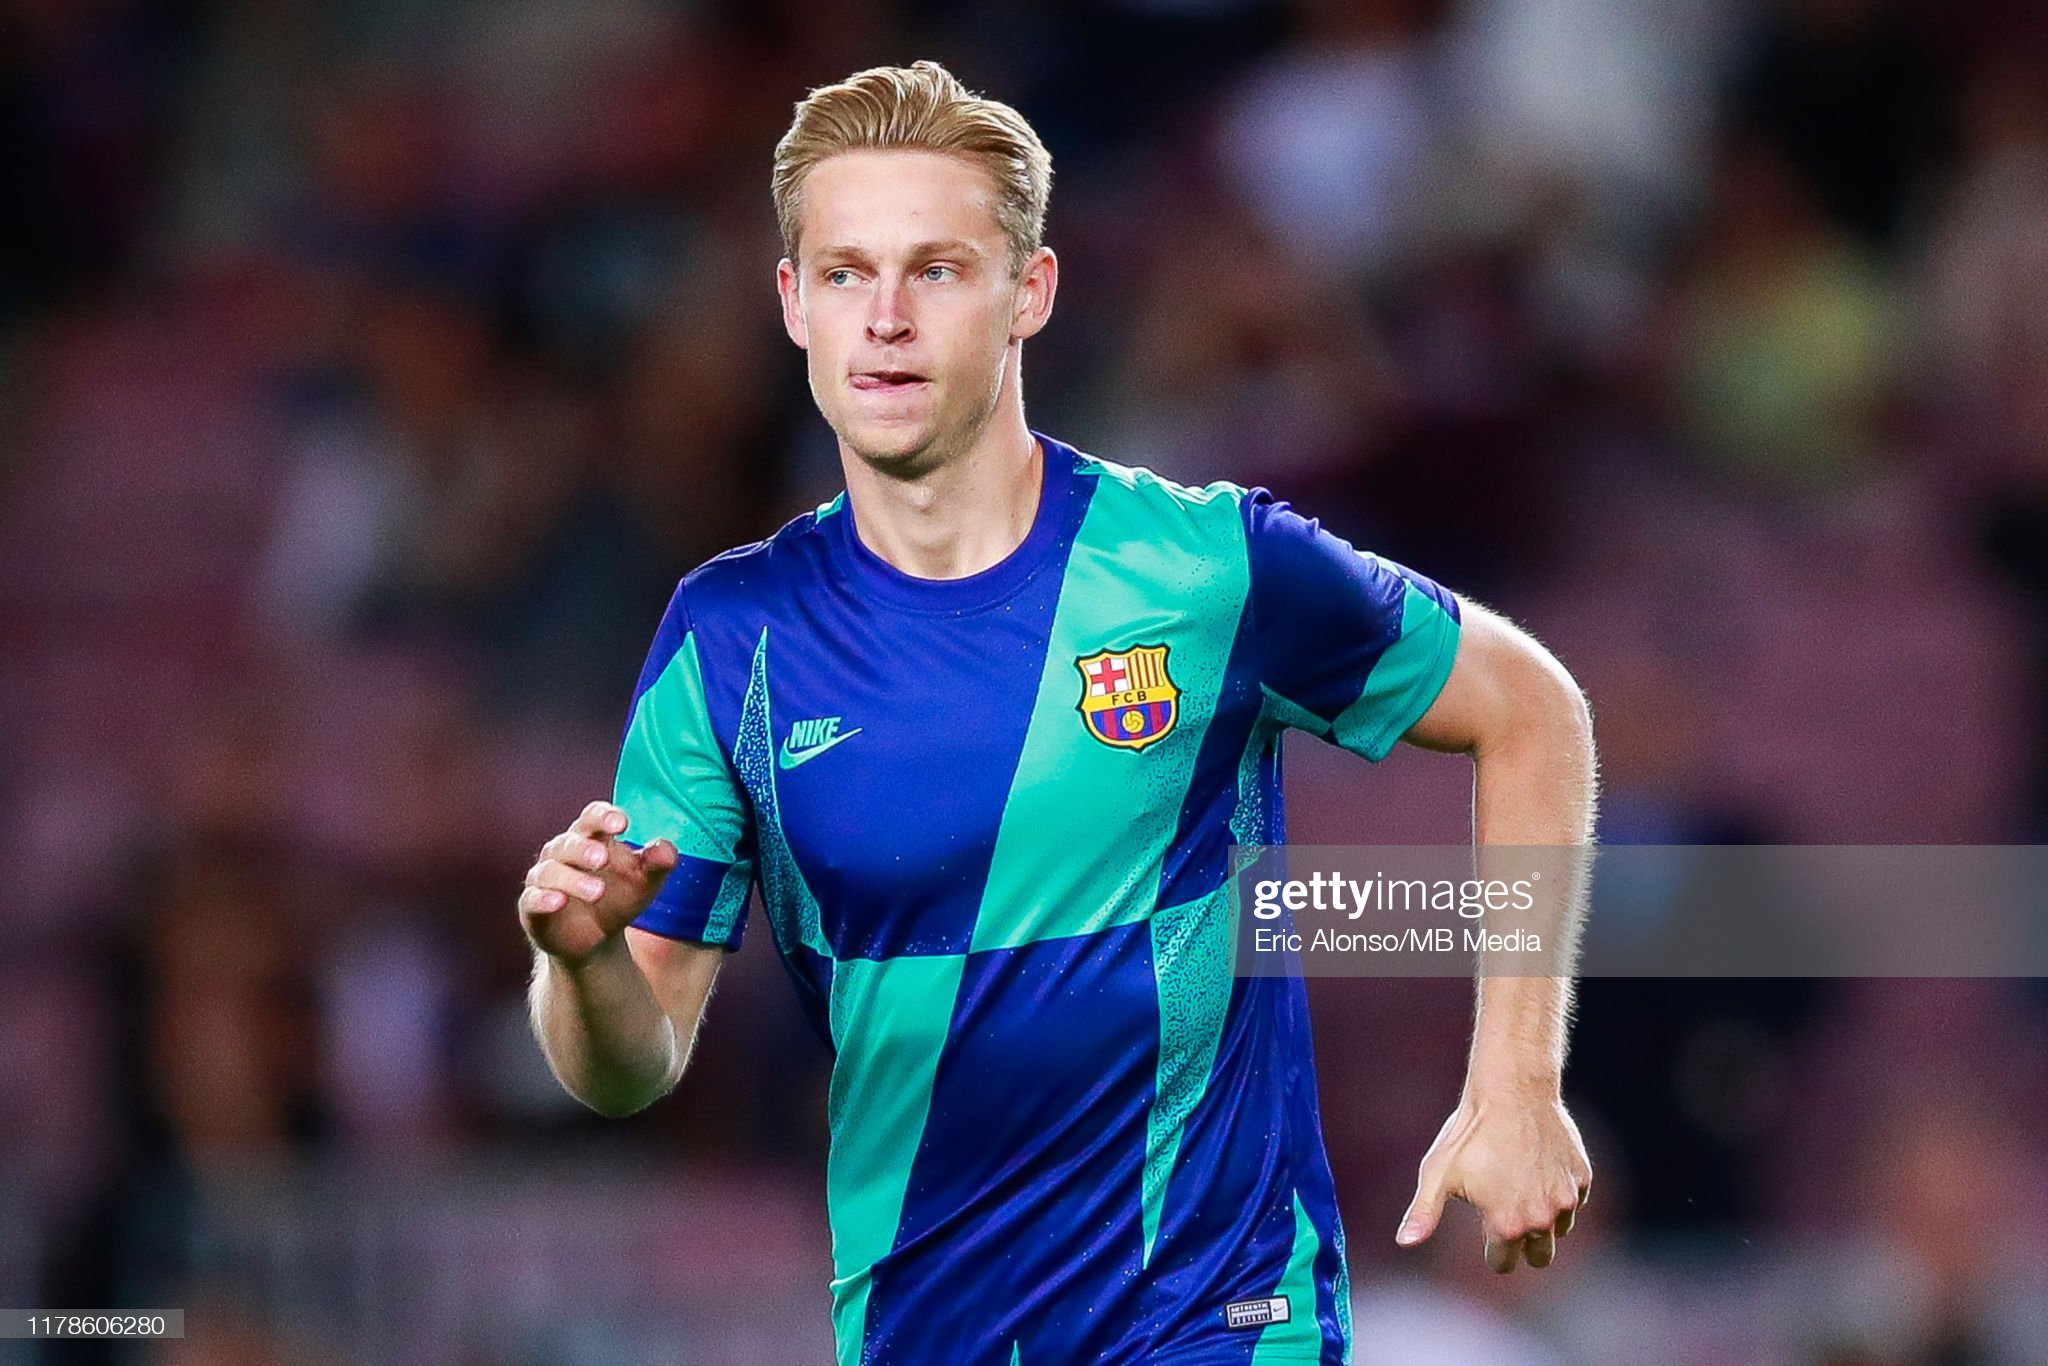 صور مباراة : برشلونة - إنتر 2-1 ( 02-10-2019 )  Frenkie-de-jong-of-fc-barcelona-during-the-warm-up-of-the-uefa-f-picture-id1178606280?s=2048x2048